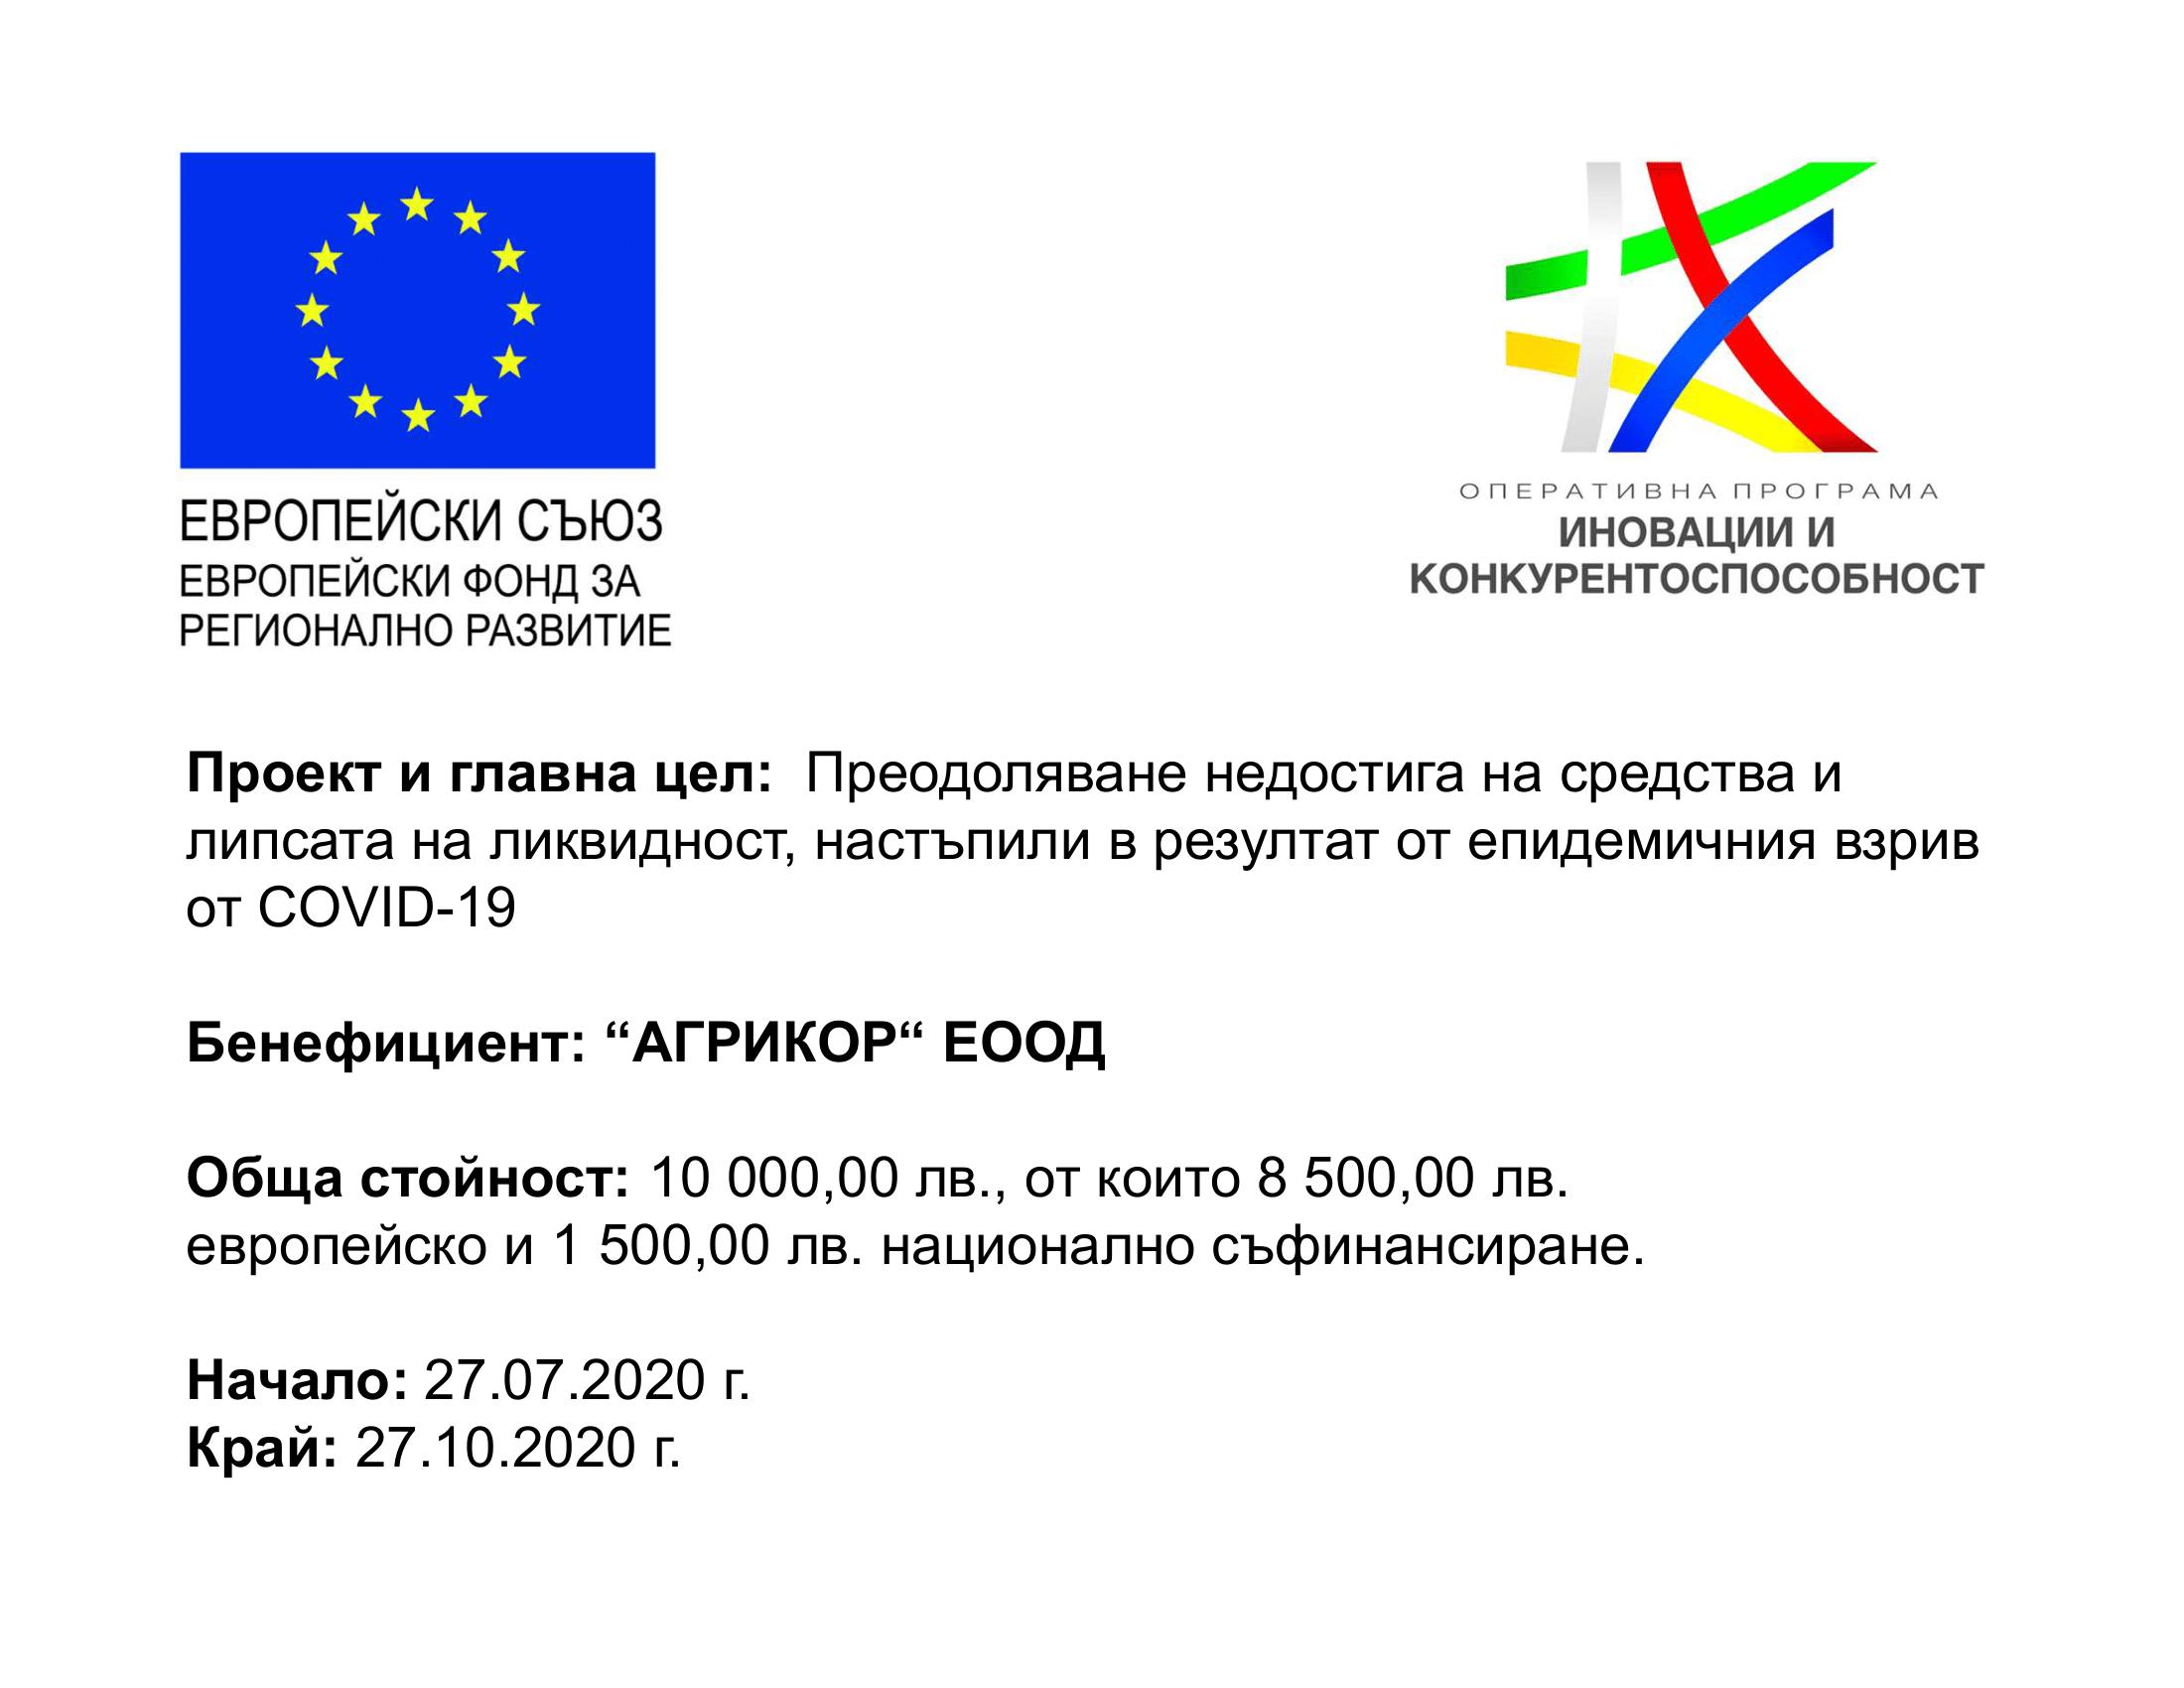 plakat_upd-1